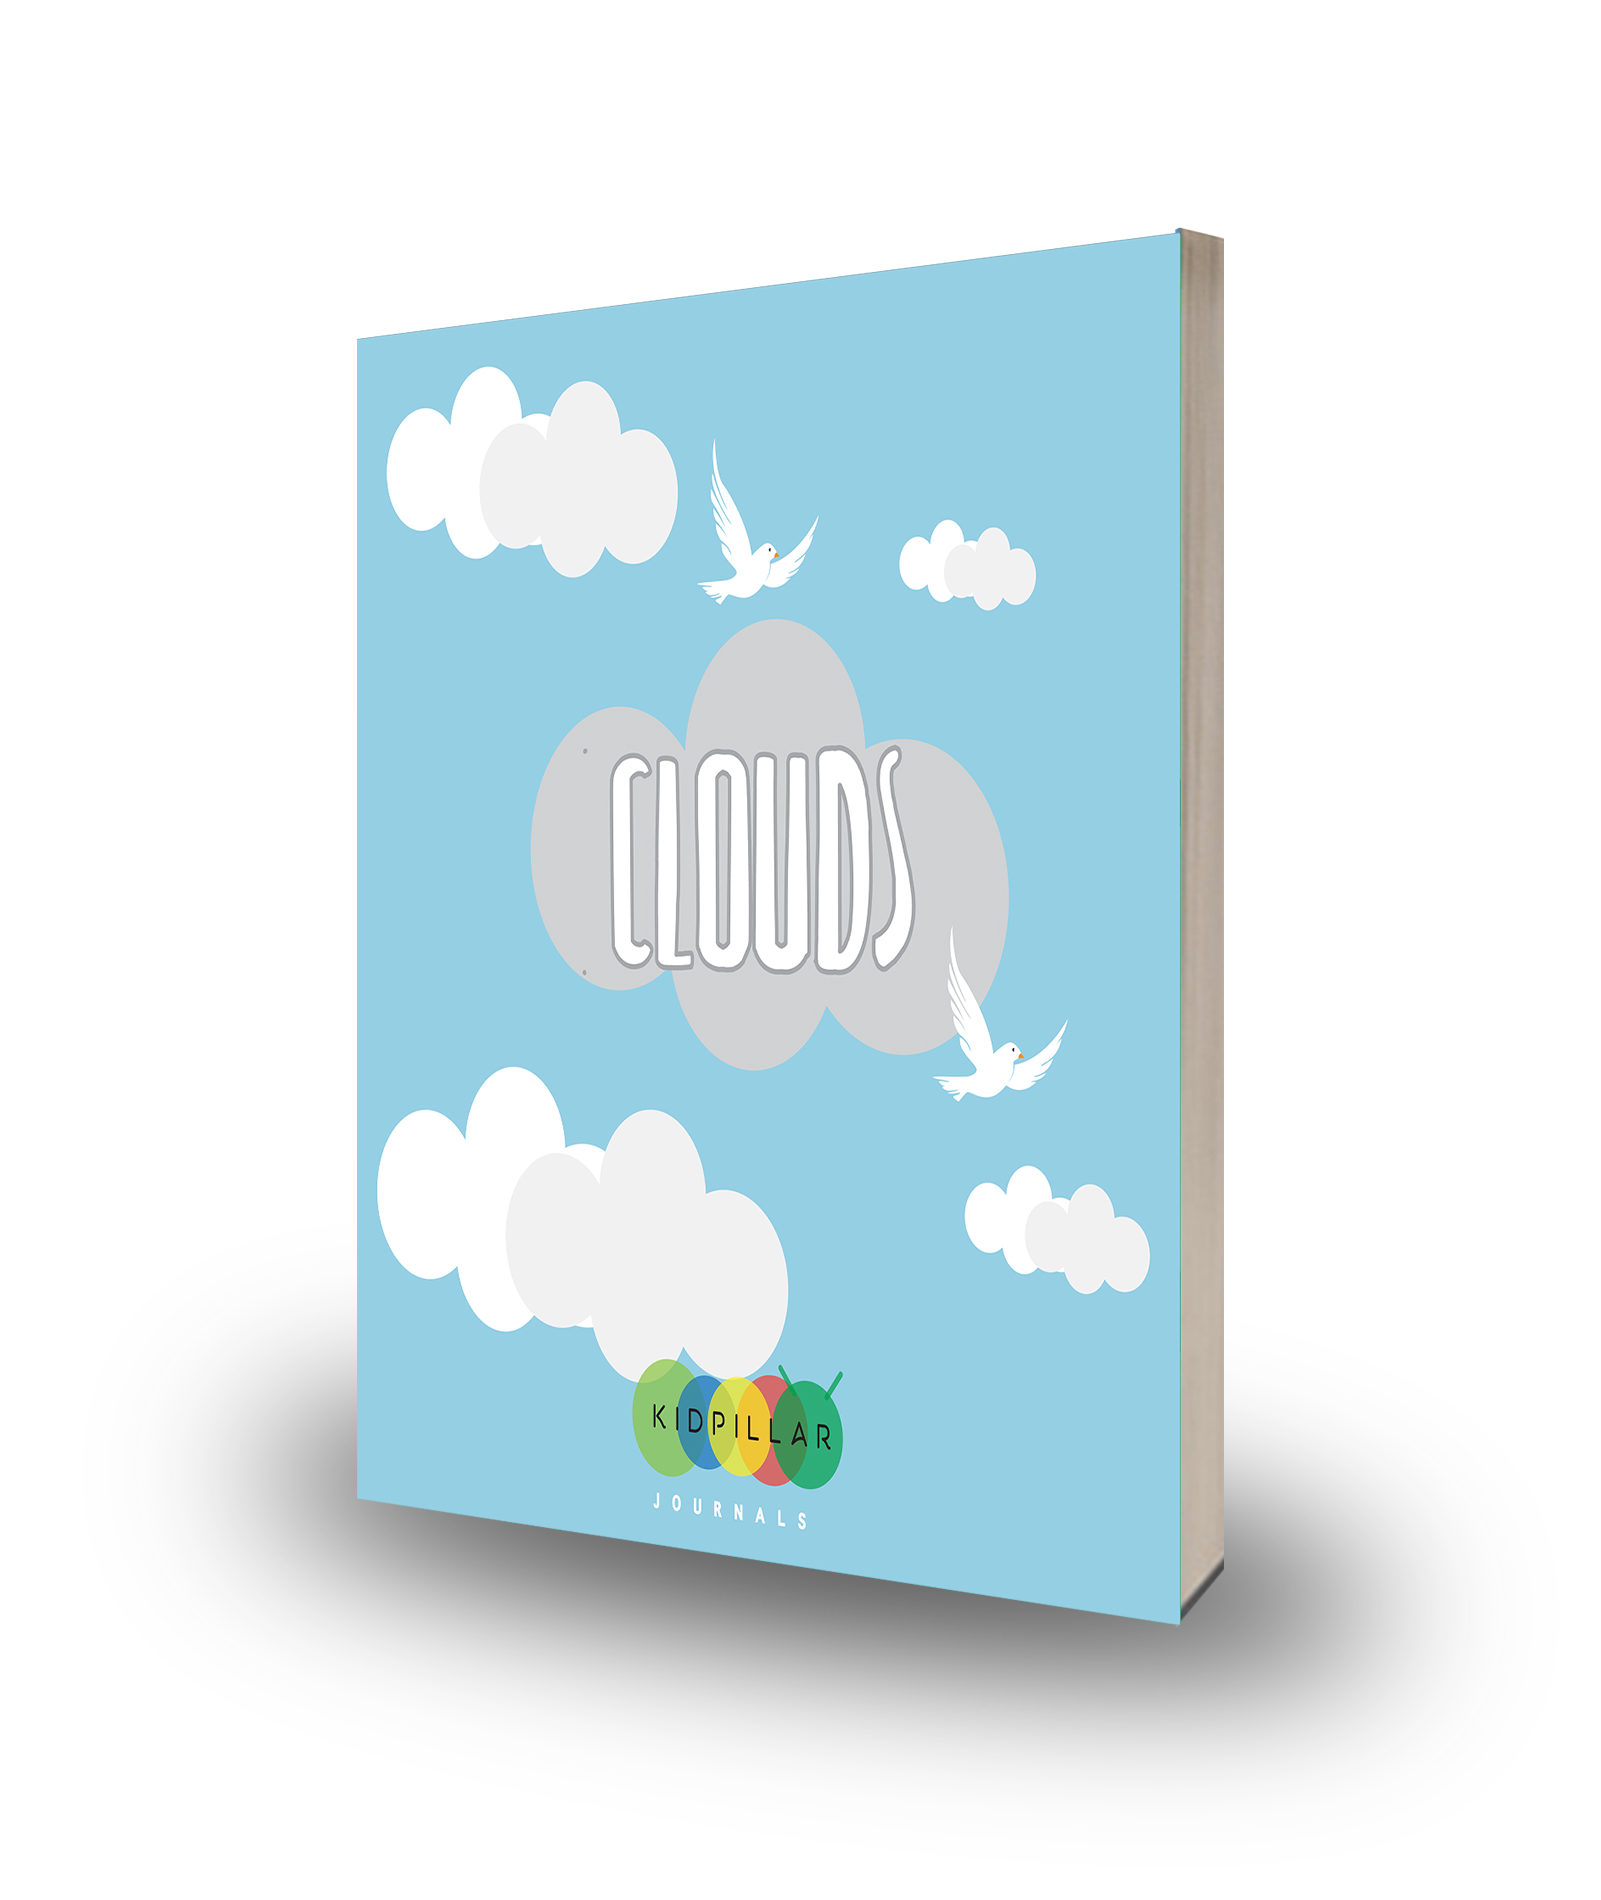 Clouds Cloud Type